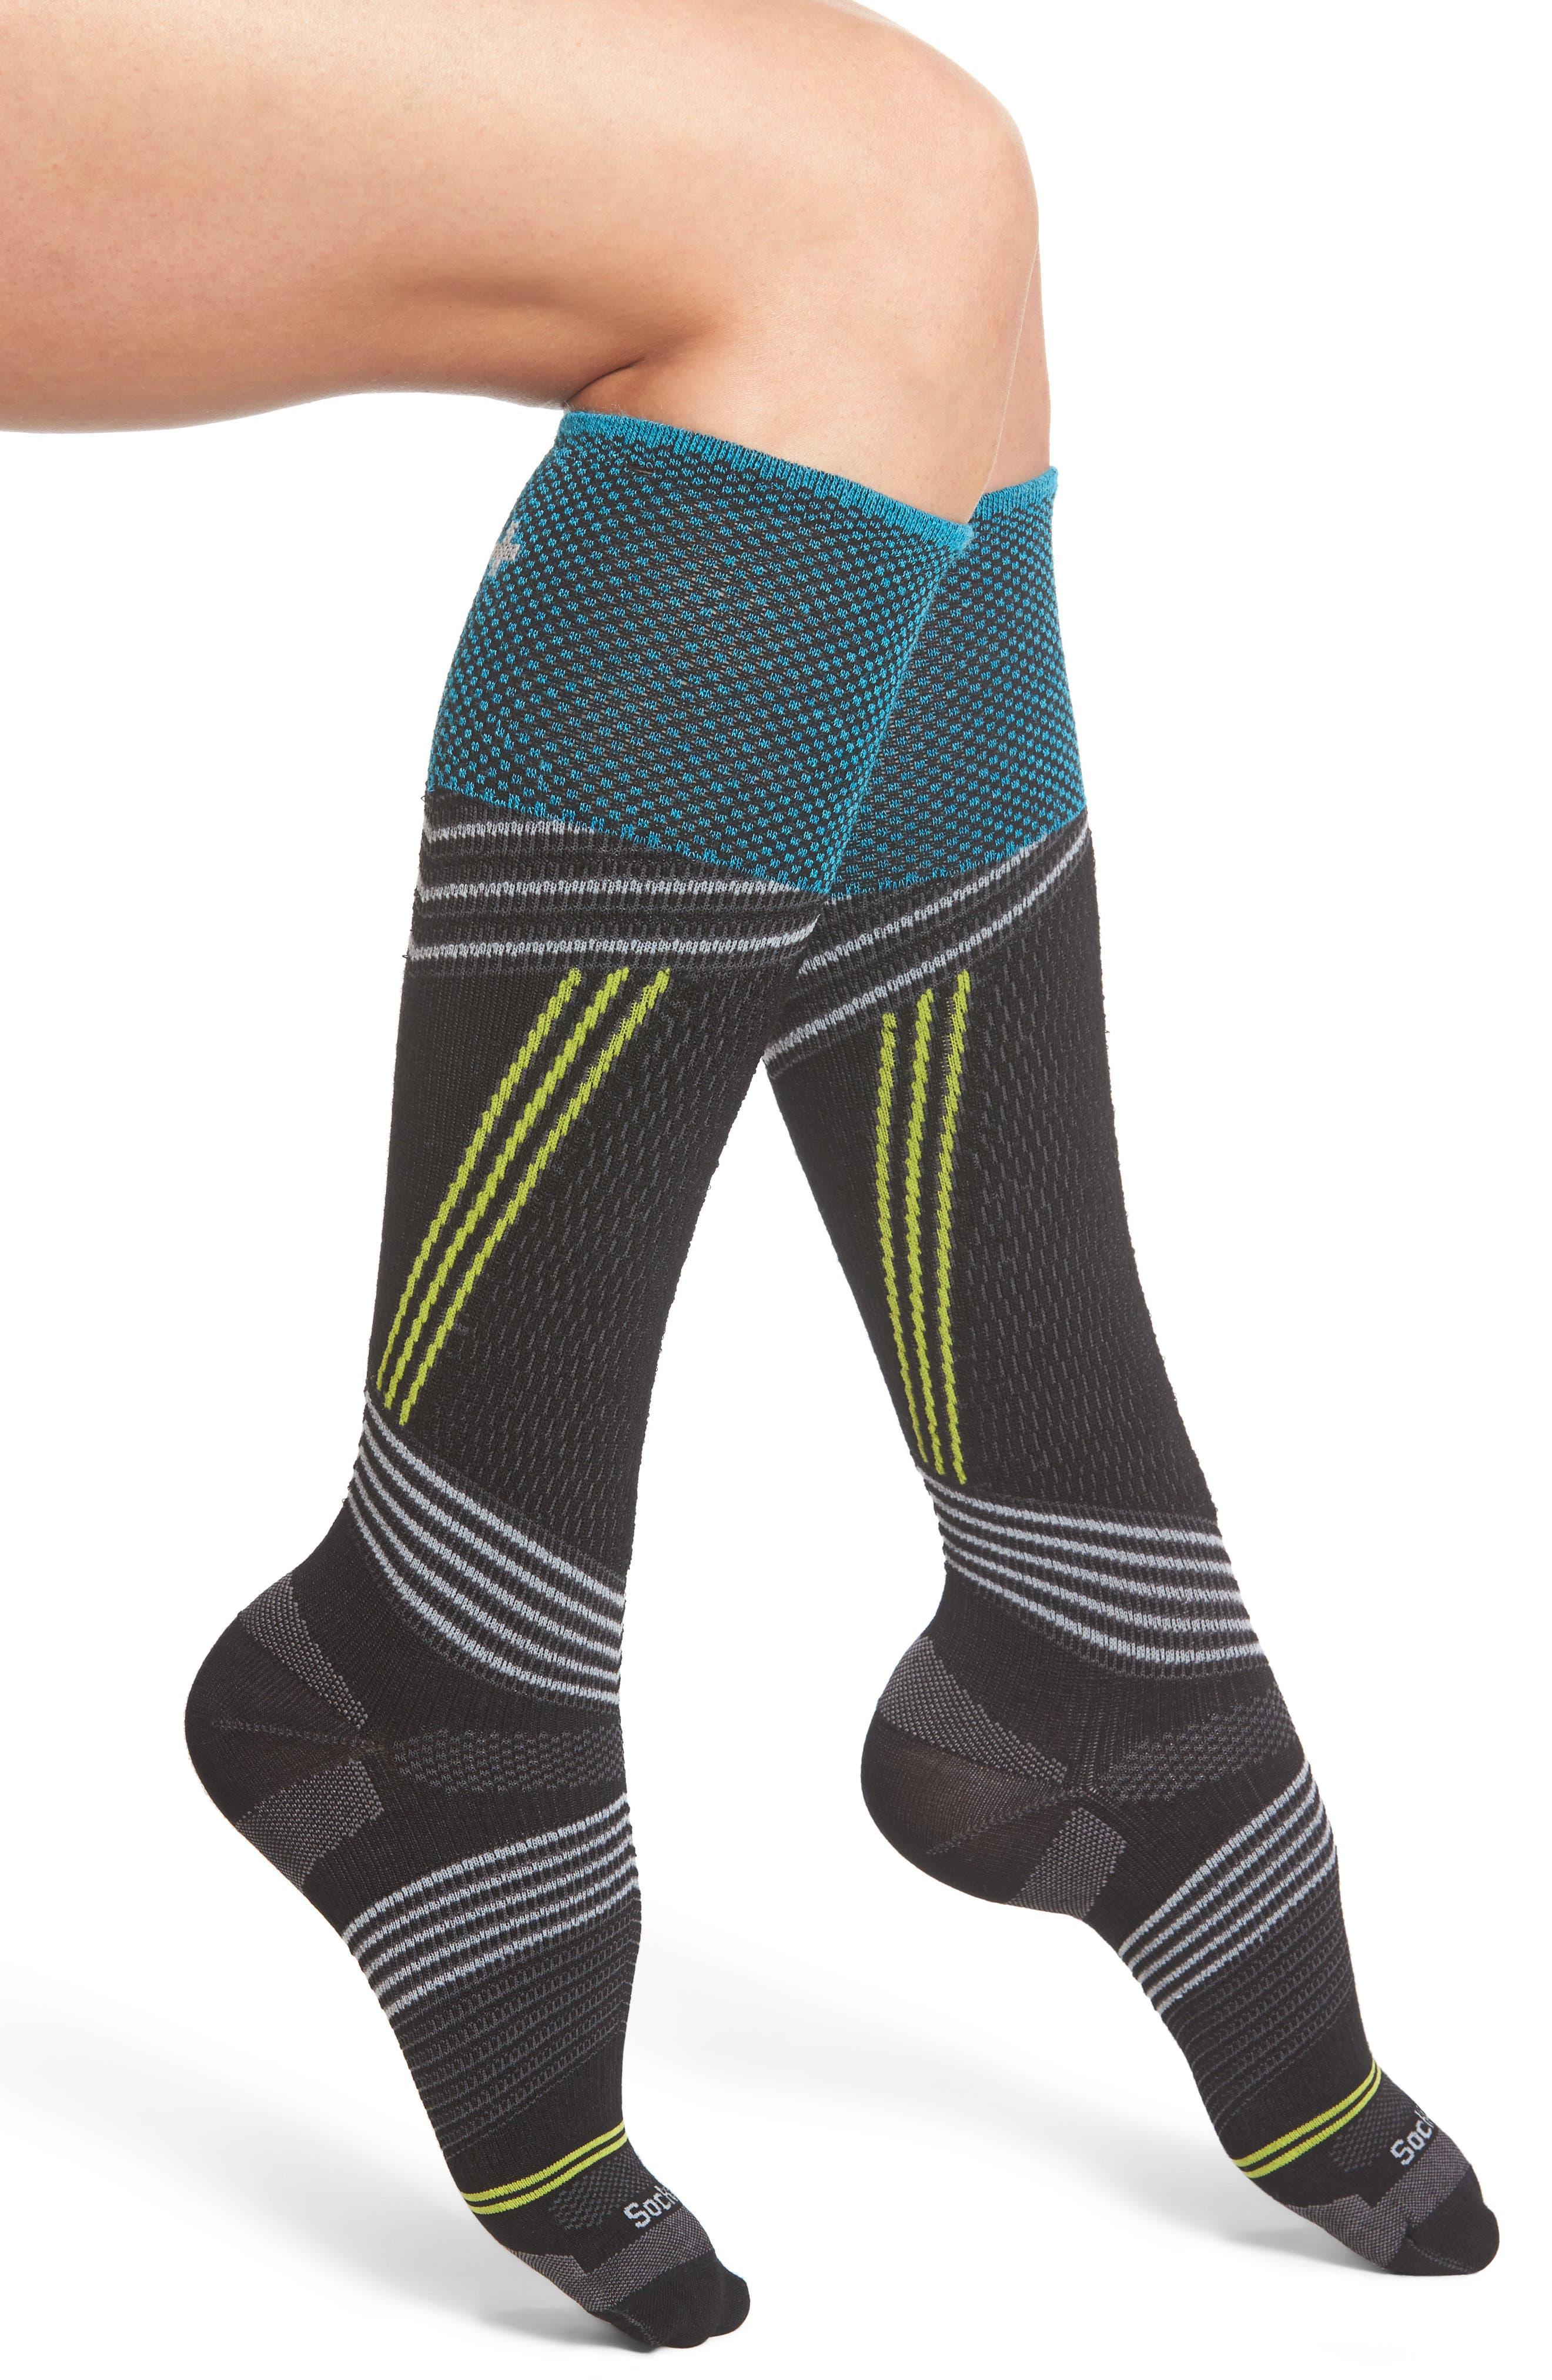 Ski Alpine Racer Compression Knee Socks,                             Main thumbnail 1, color,                             001